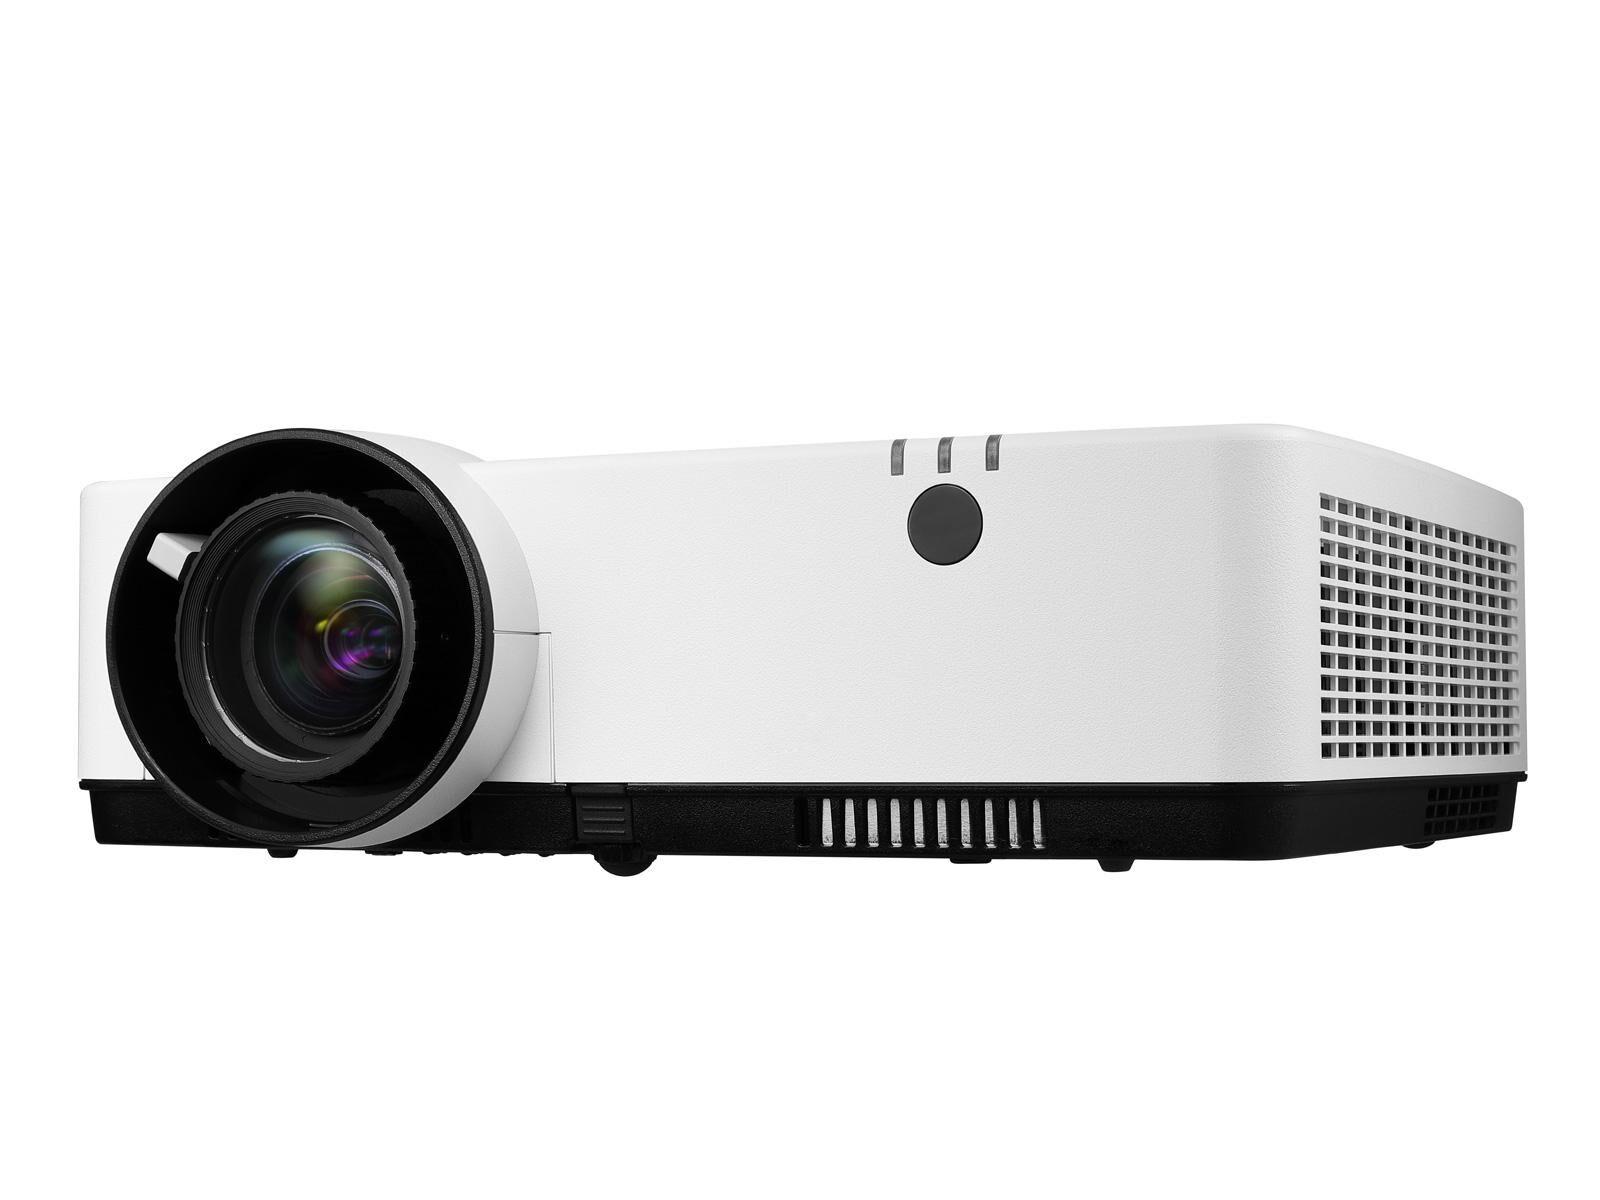 NEC ME382U vidéo-projecteur 3800 ANSI lumens 3LCD WUXGA (1920x1200) Projecteur de bureau Blanc